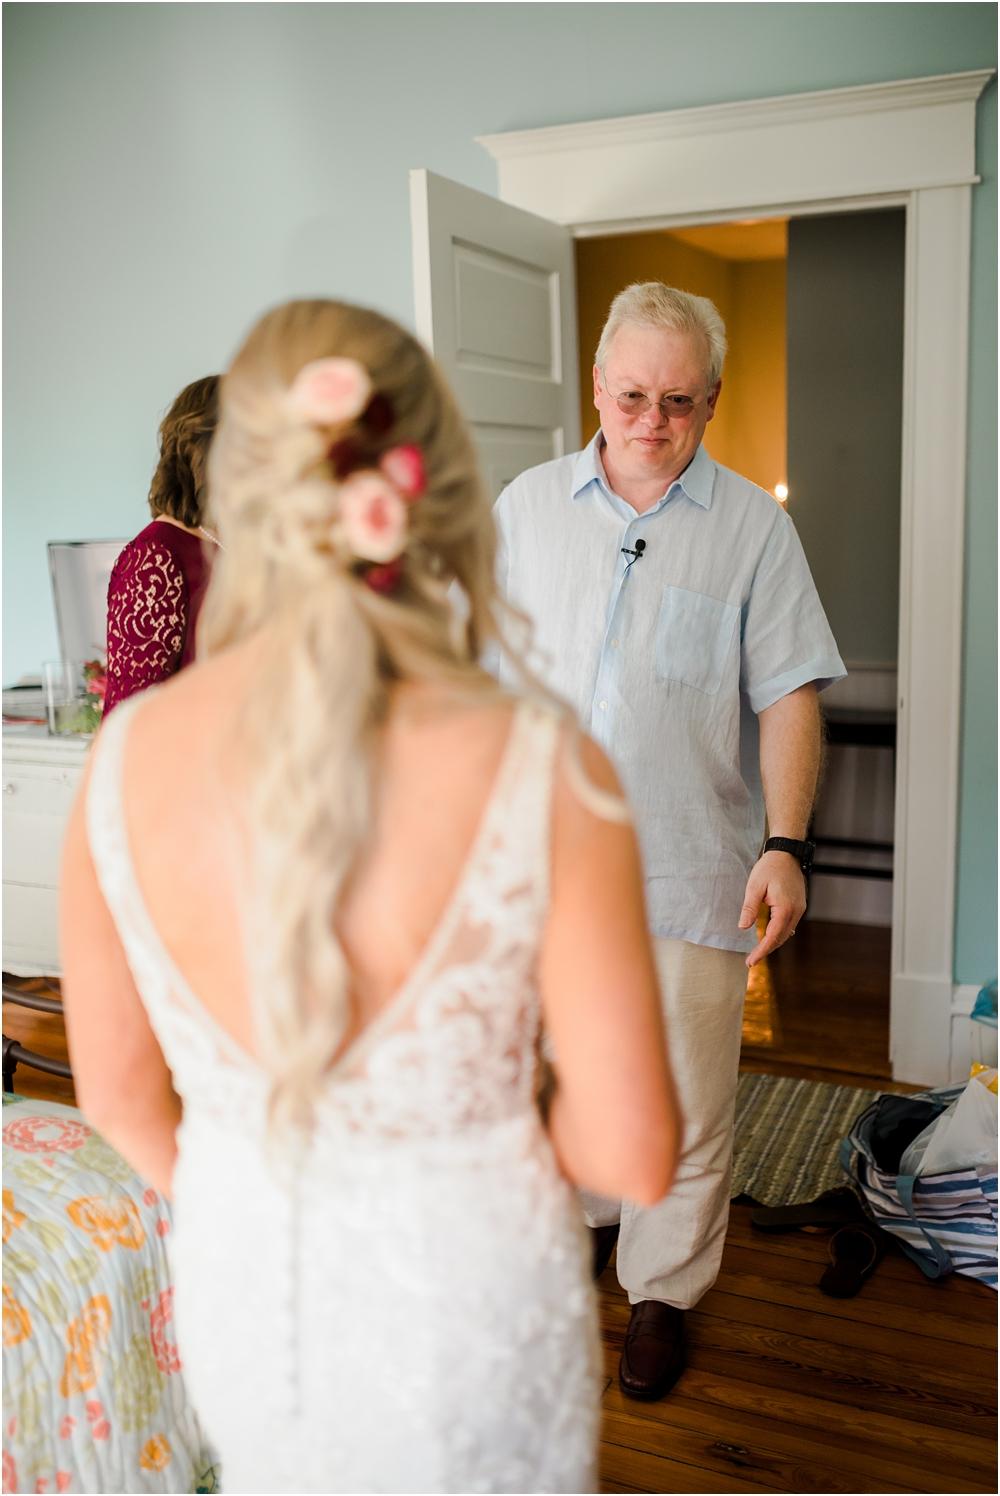 mcglothlin-wedding-kiersten-stevenson-photography-30a-panama-city-beach-dothan-tallahassee-(40-of-145).jpg